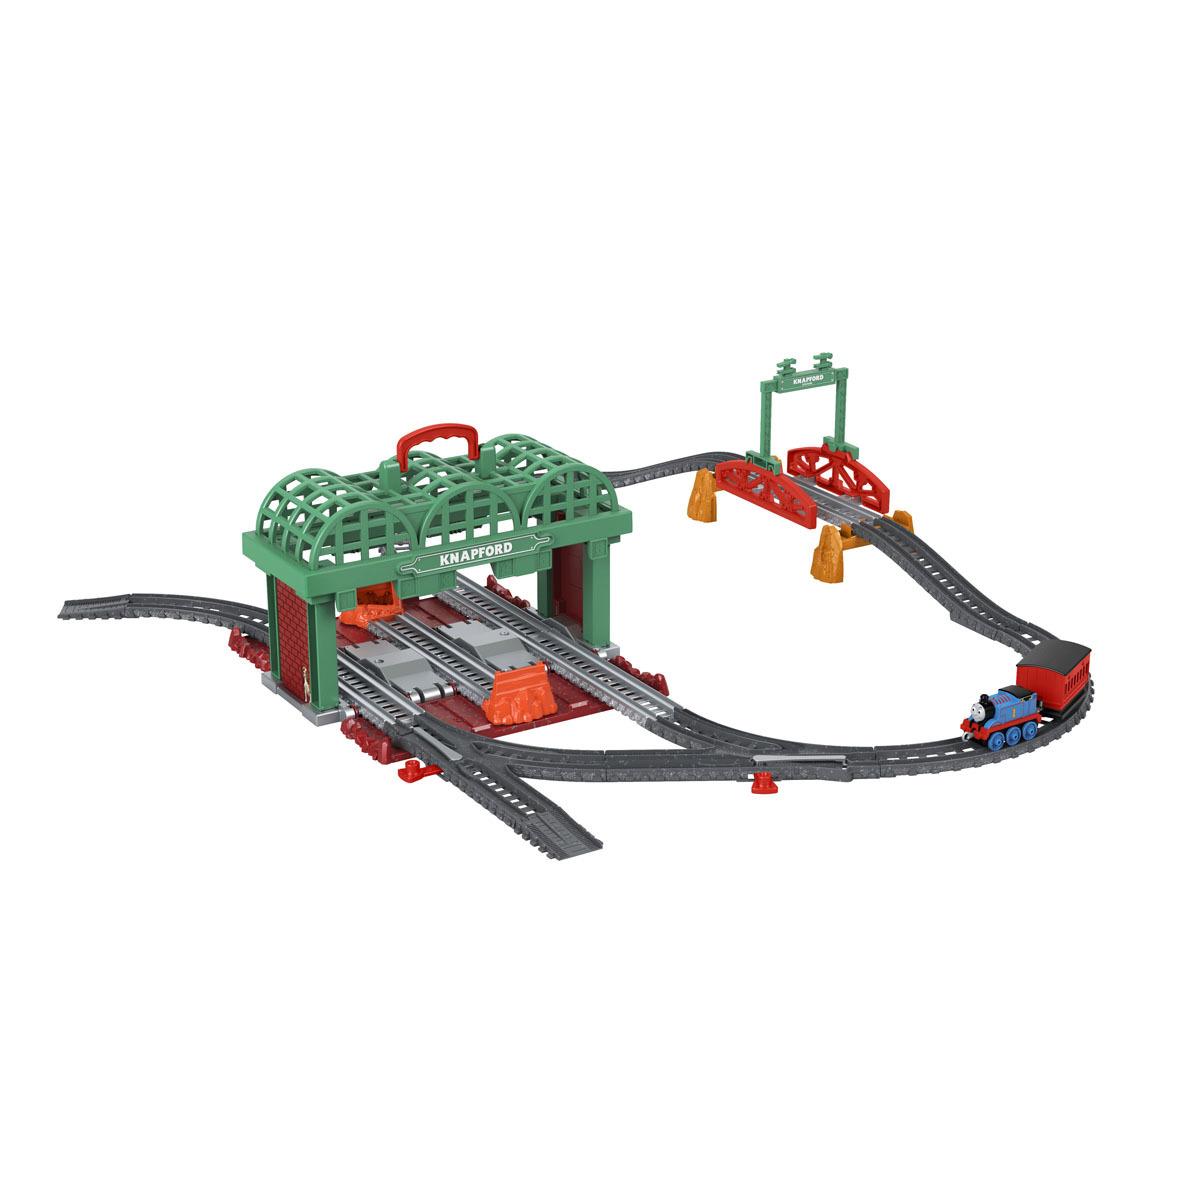 Fisher-Price Thomas & Friends Knapford Train Set -  Station